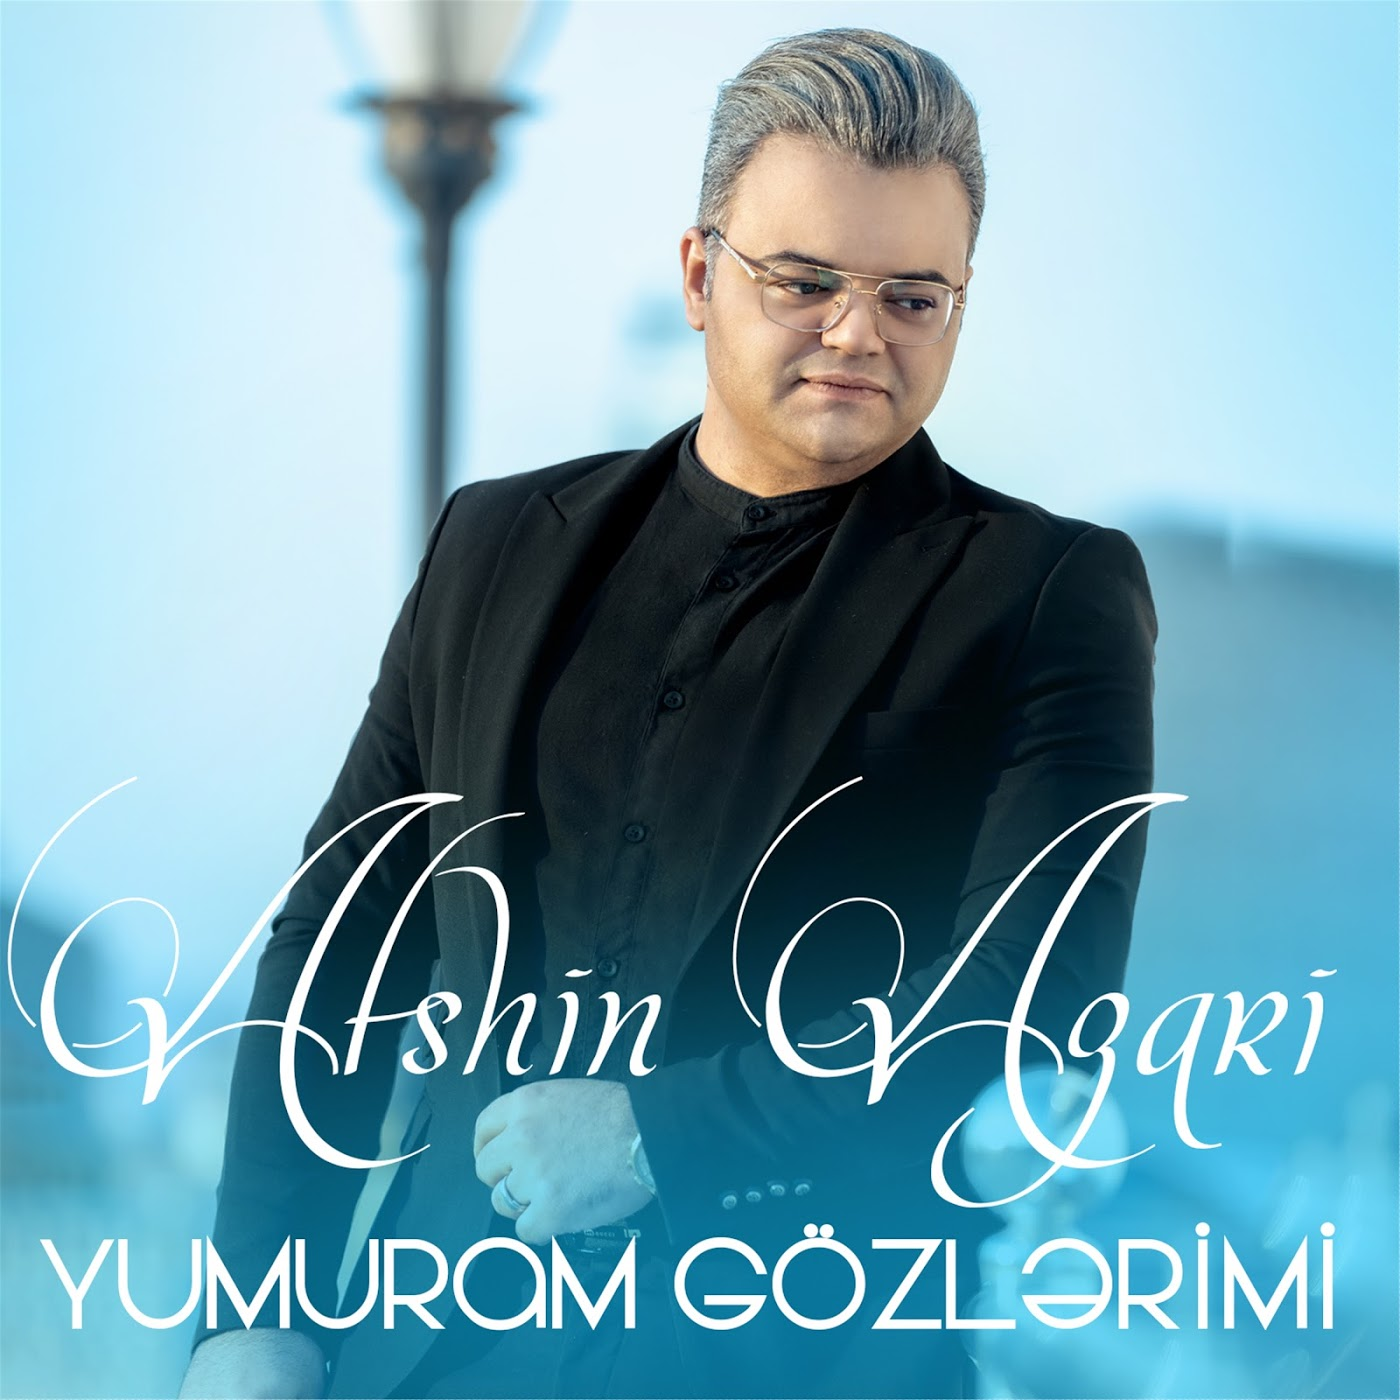 https://s16.picofile.com/file/8426325484/01Afshin_Azari_Yumuram_Gozlerimi.jpg